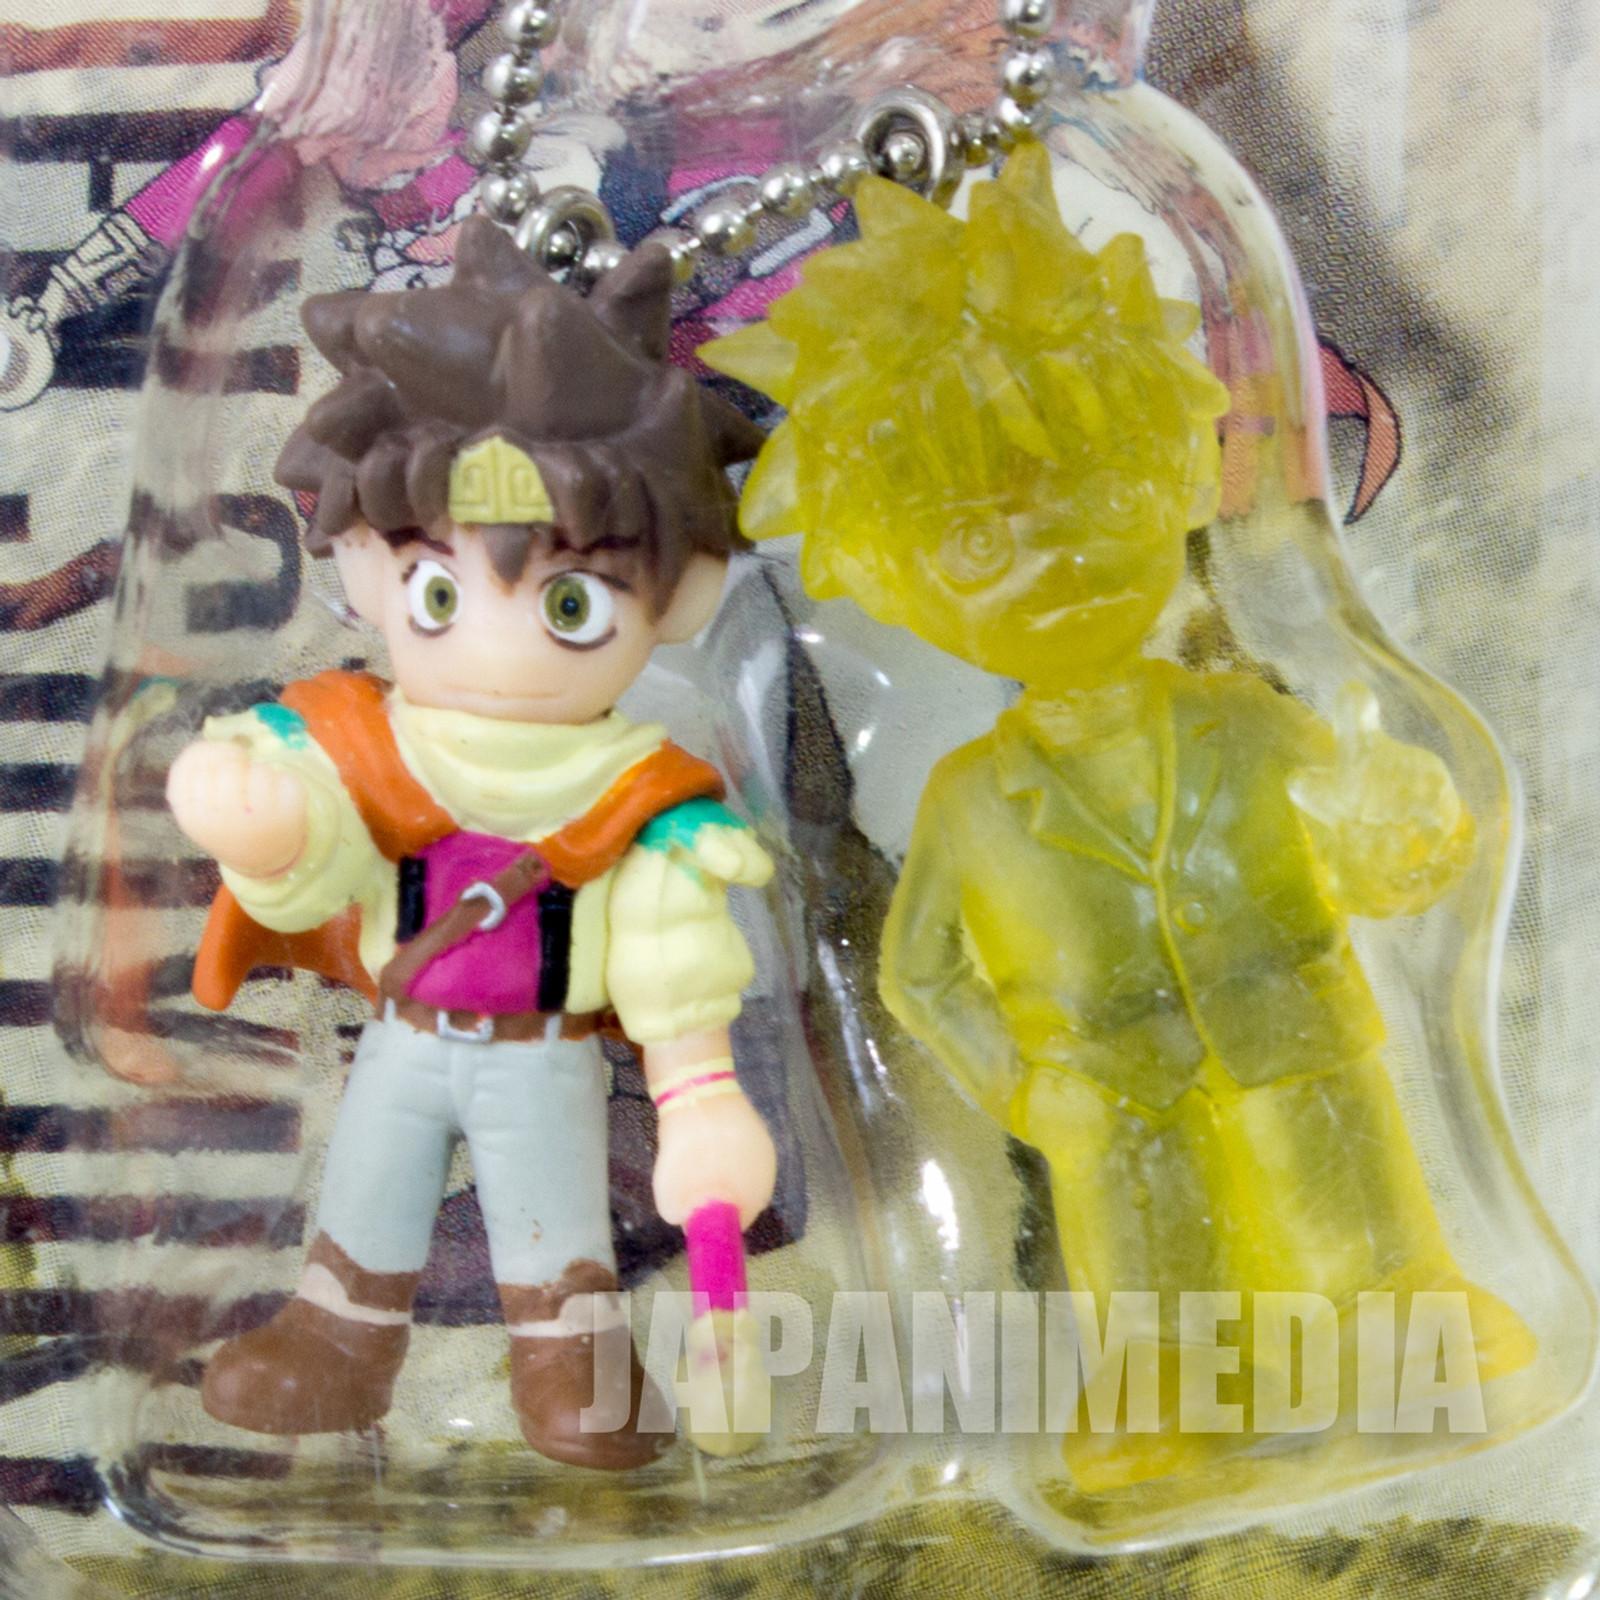 Gensomaden SAIYUKI Son Goku Mascot Figure Twin Keychain JAPAN ANIME MANGA